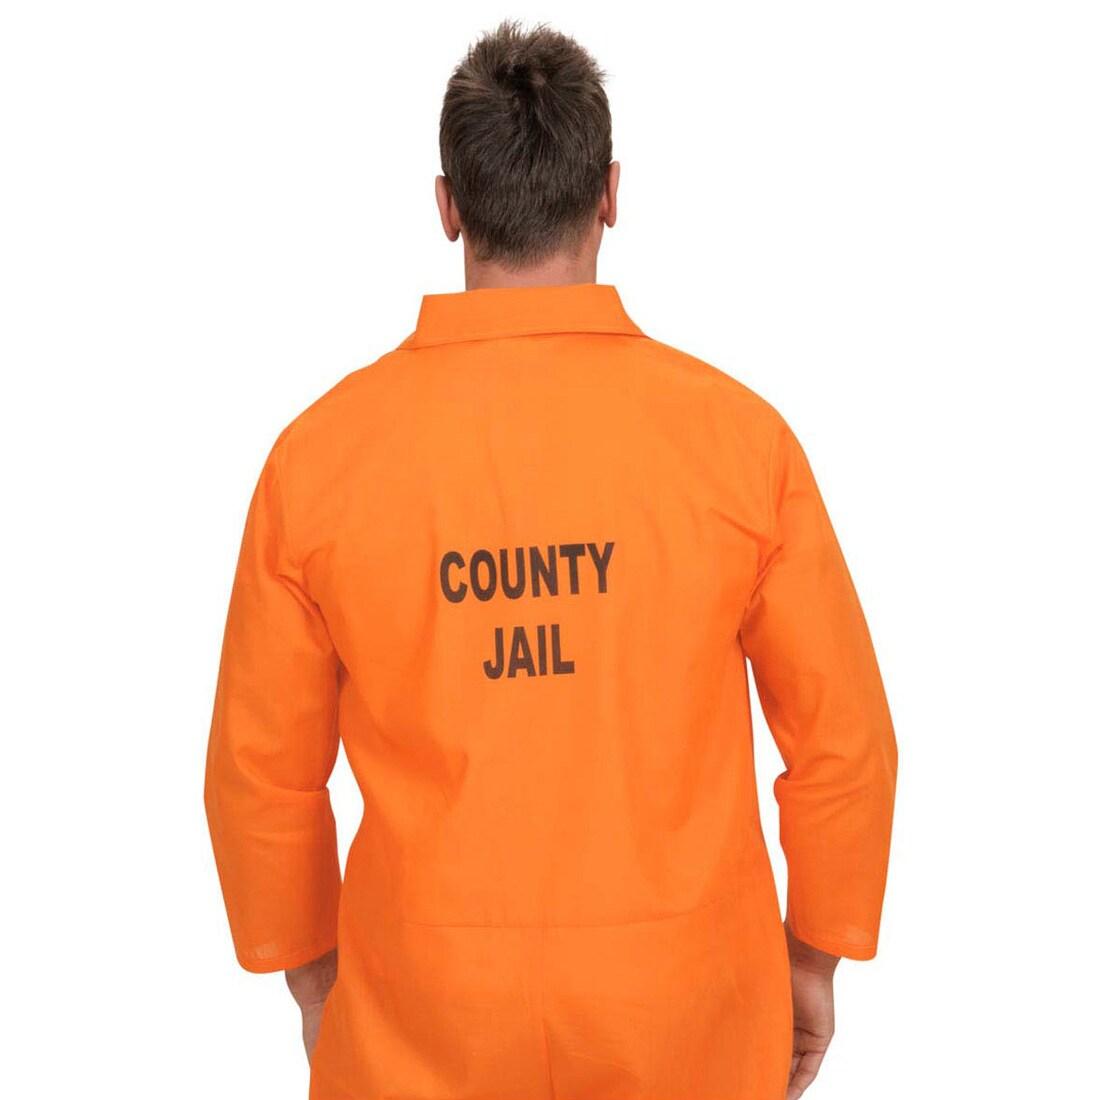 Kostüm Sträfling Gefangener Sträflingskostüm Größe M Fasching Karneval Halloween